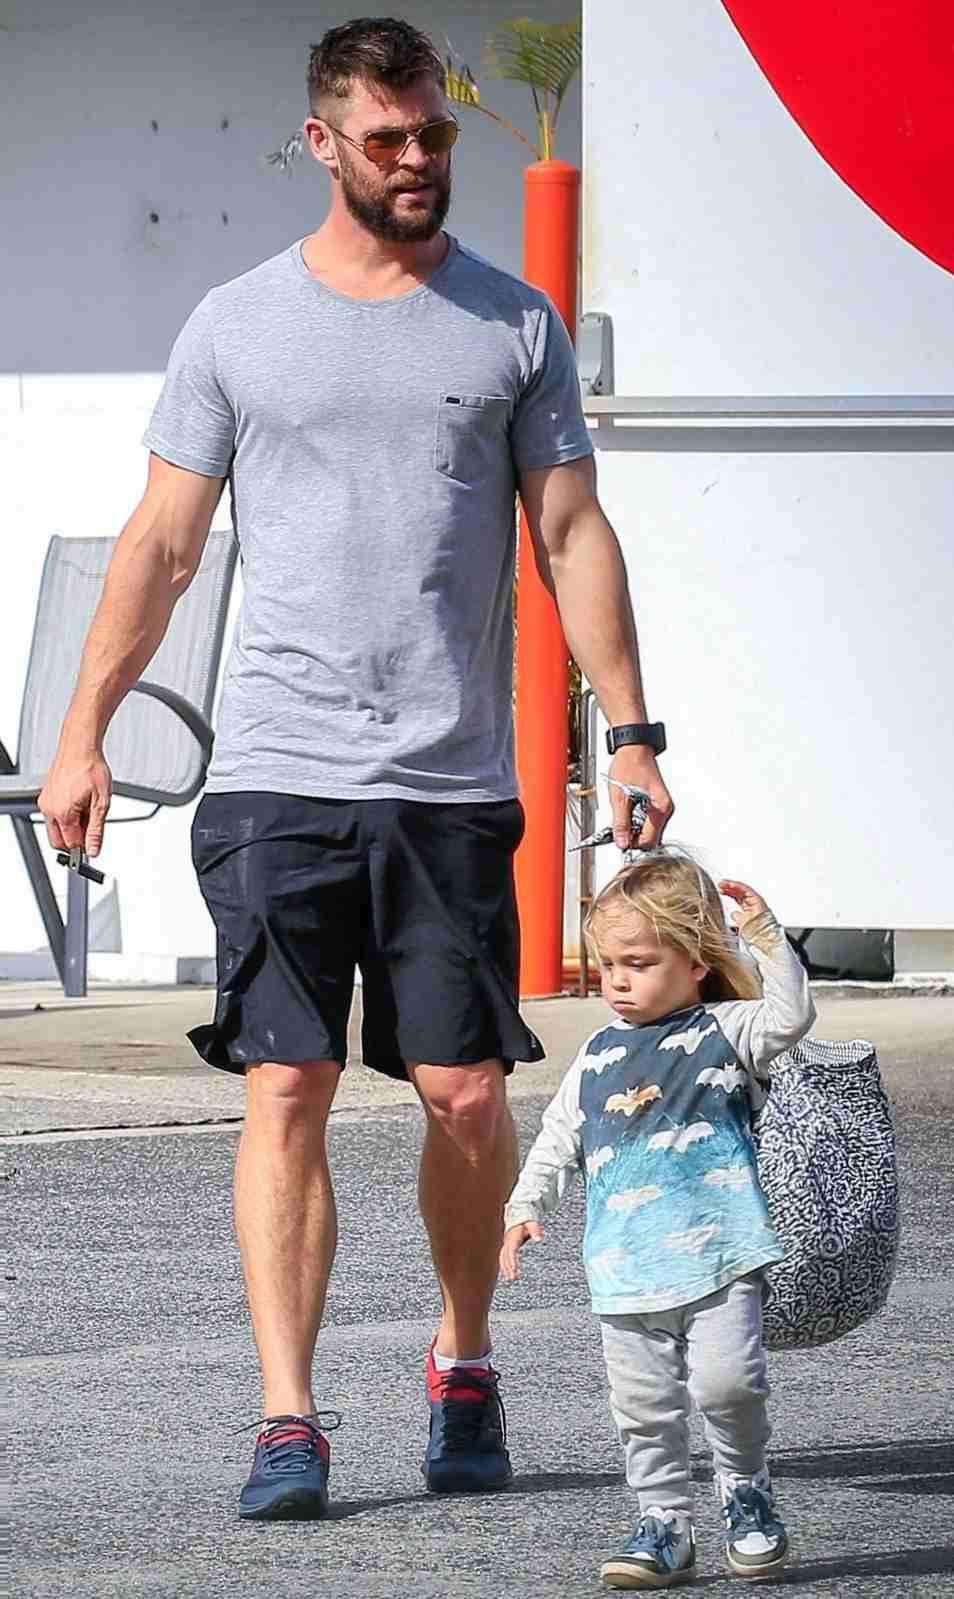 Tristan Hemsworth with his father Chris Hemsworth